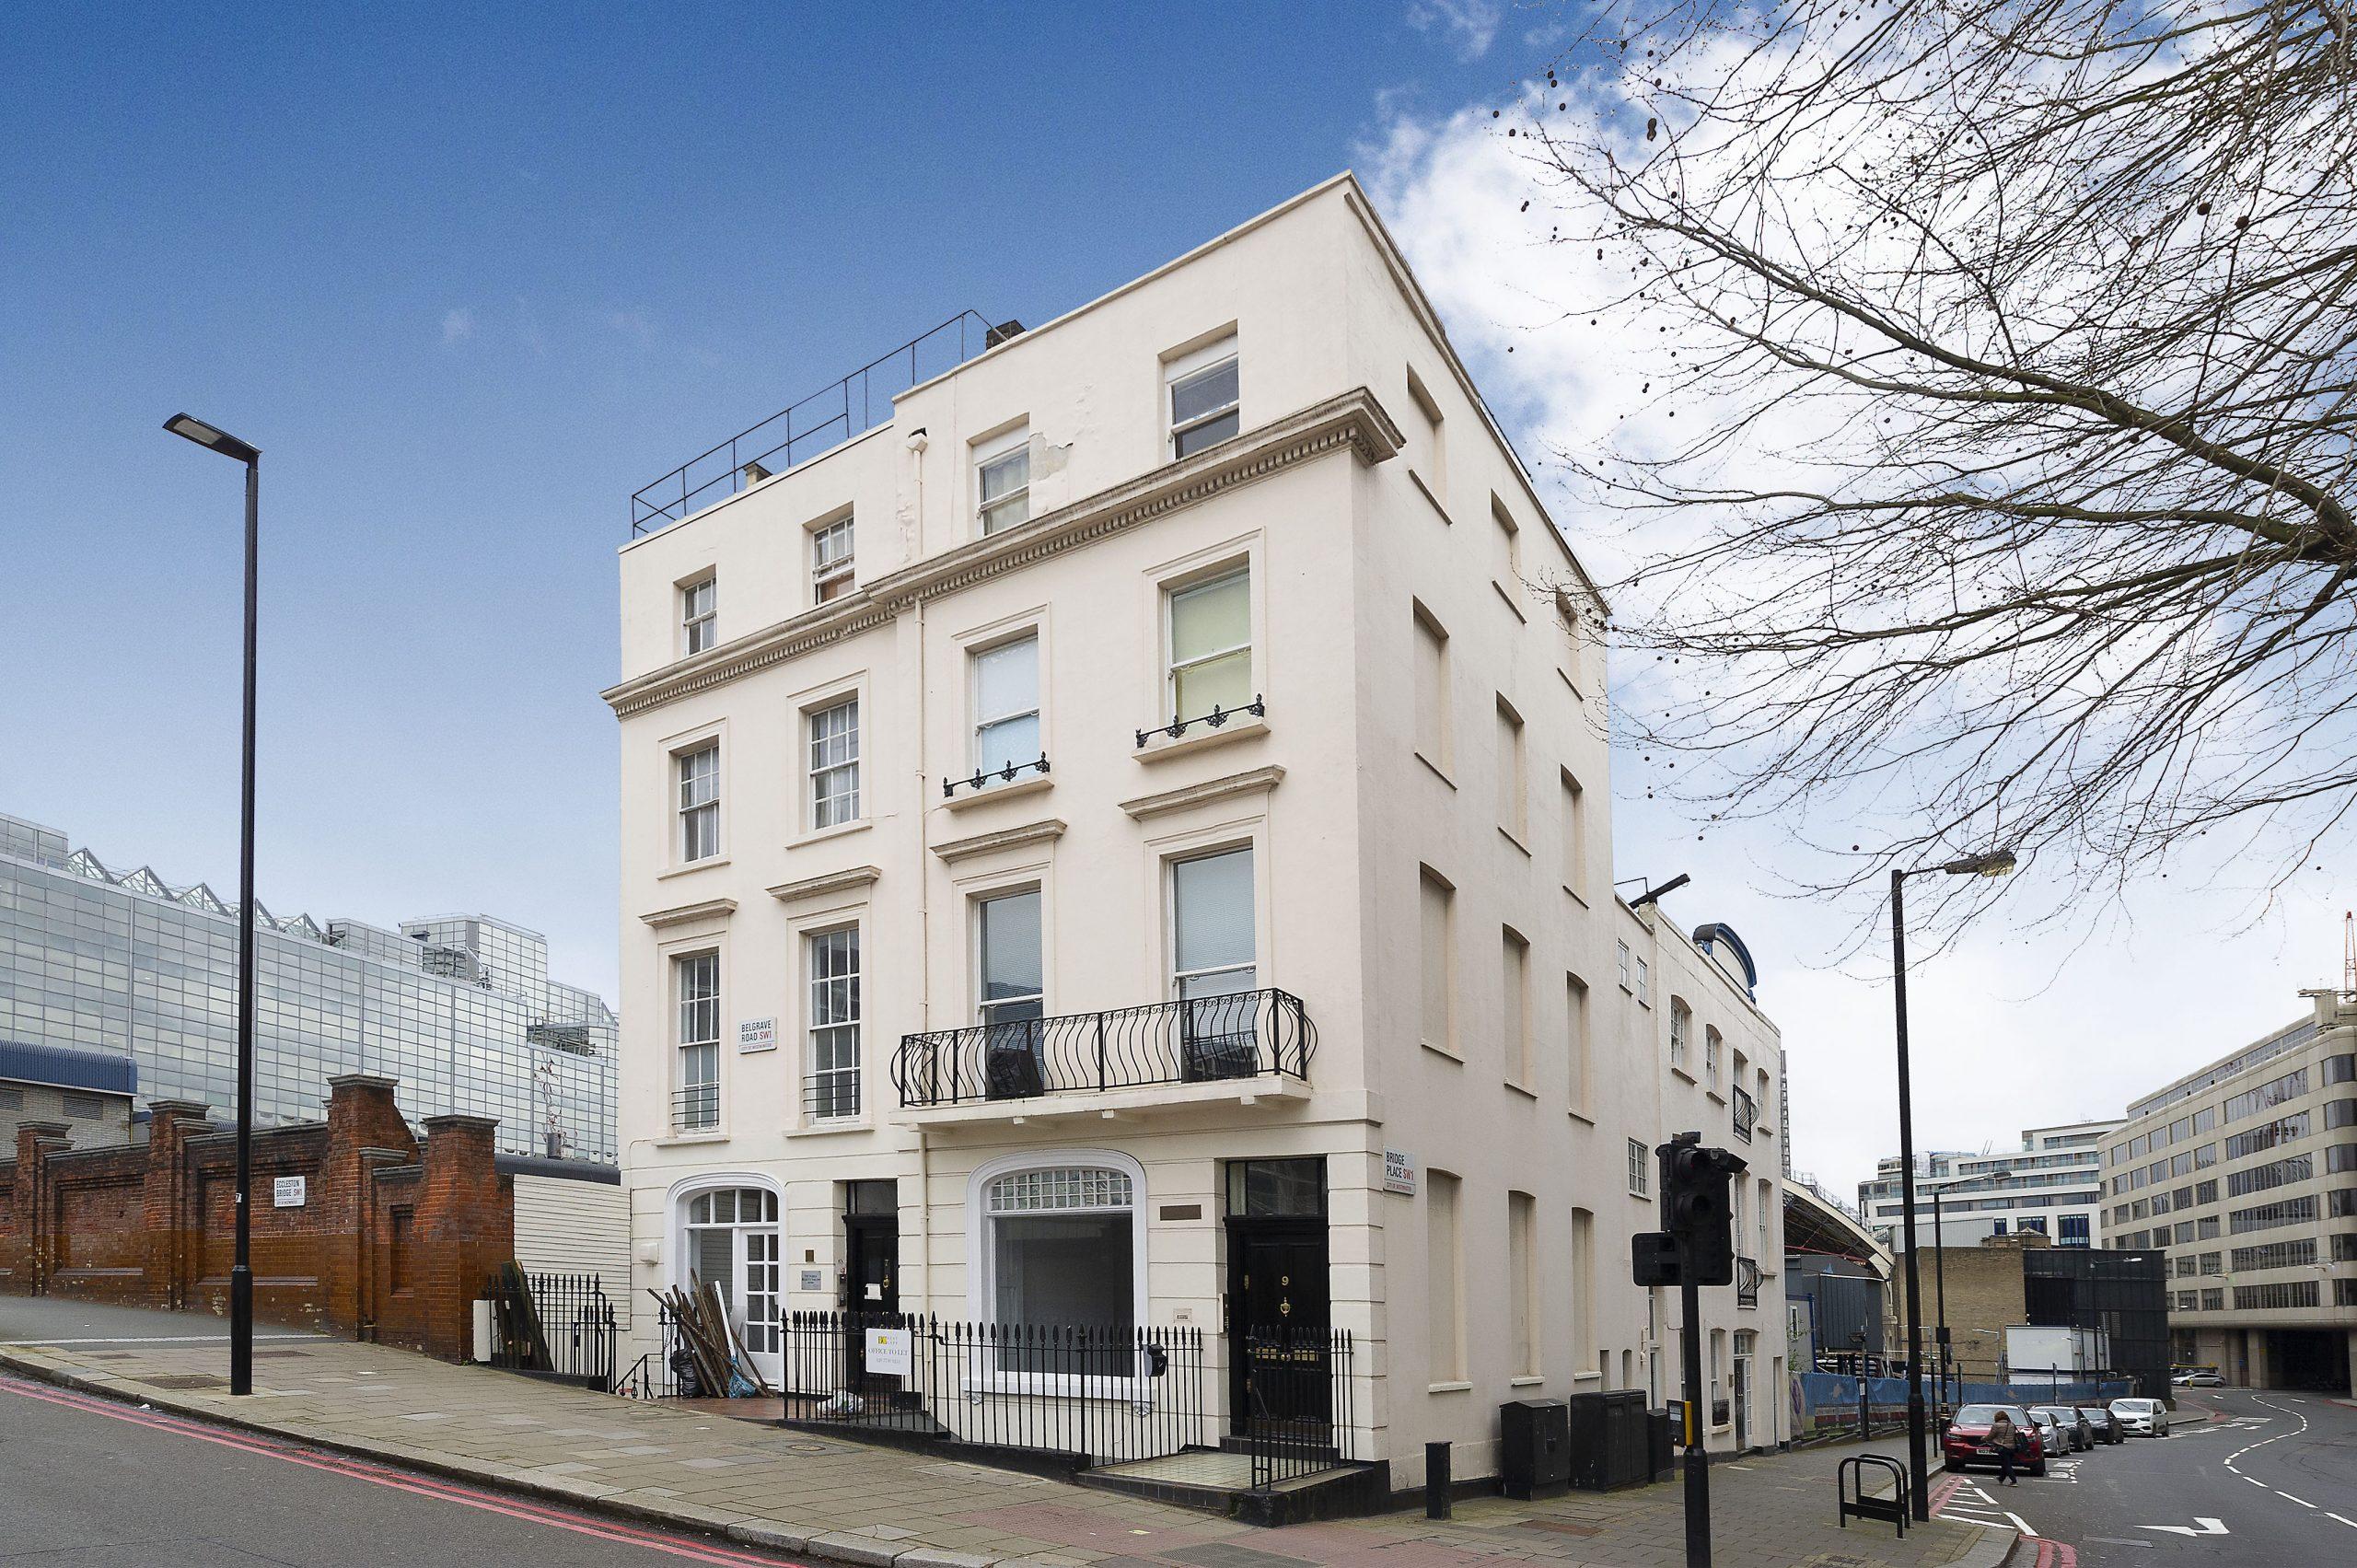 7-9 Belgrave Road, London, SW1V 1QB